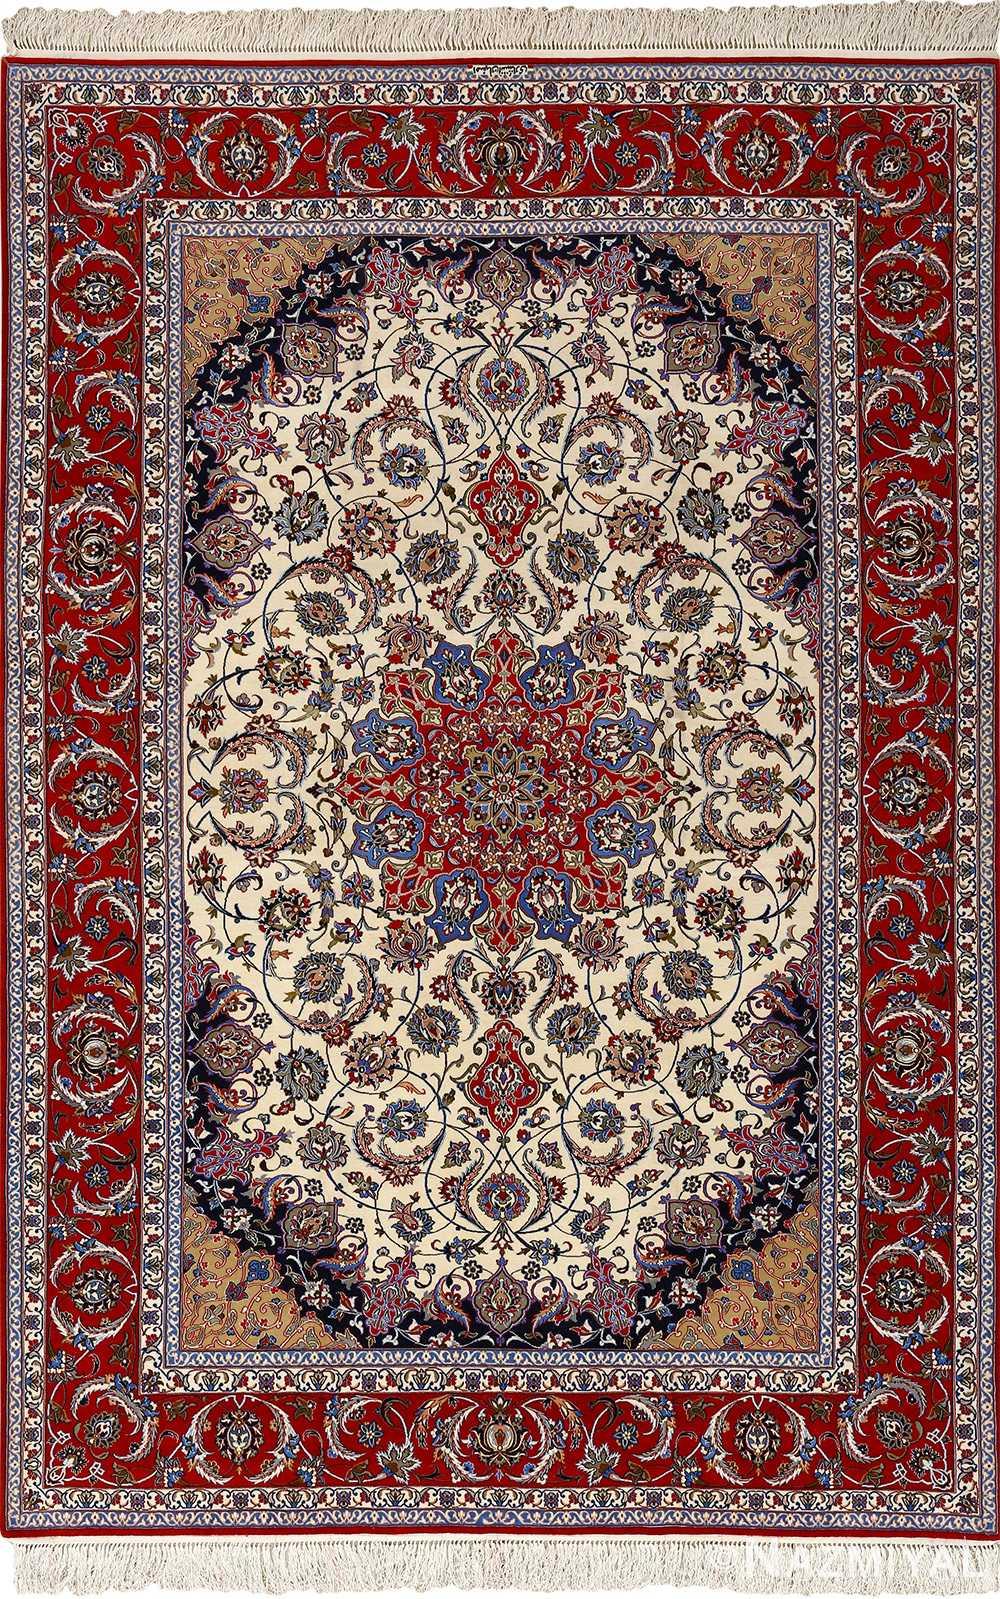 Intricate Vintage Isfahan Persian Rug 51154 By Nazmiyal